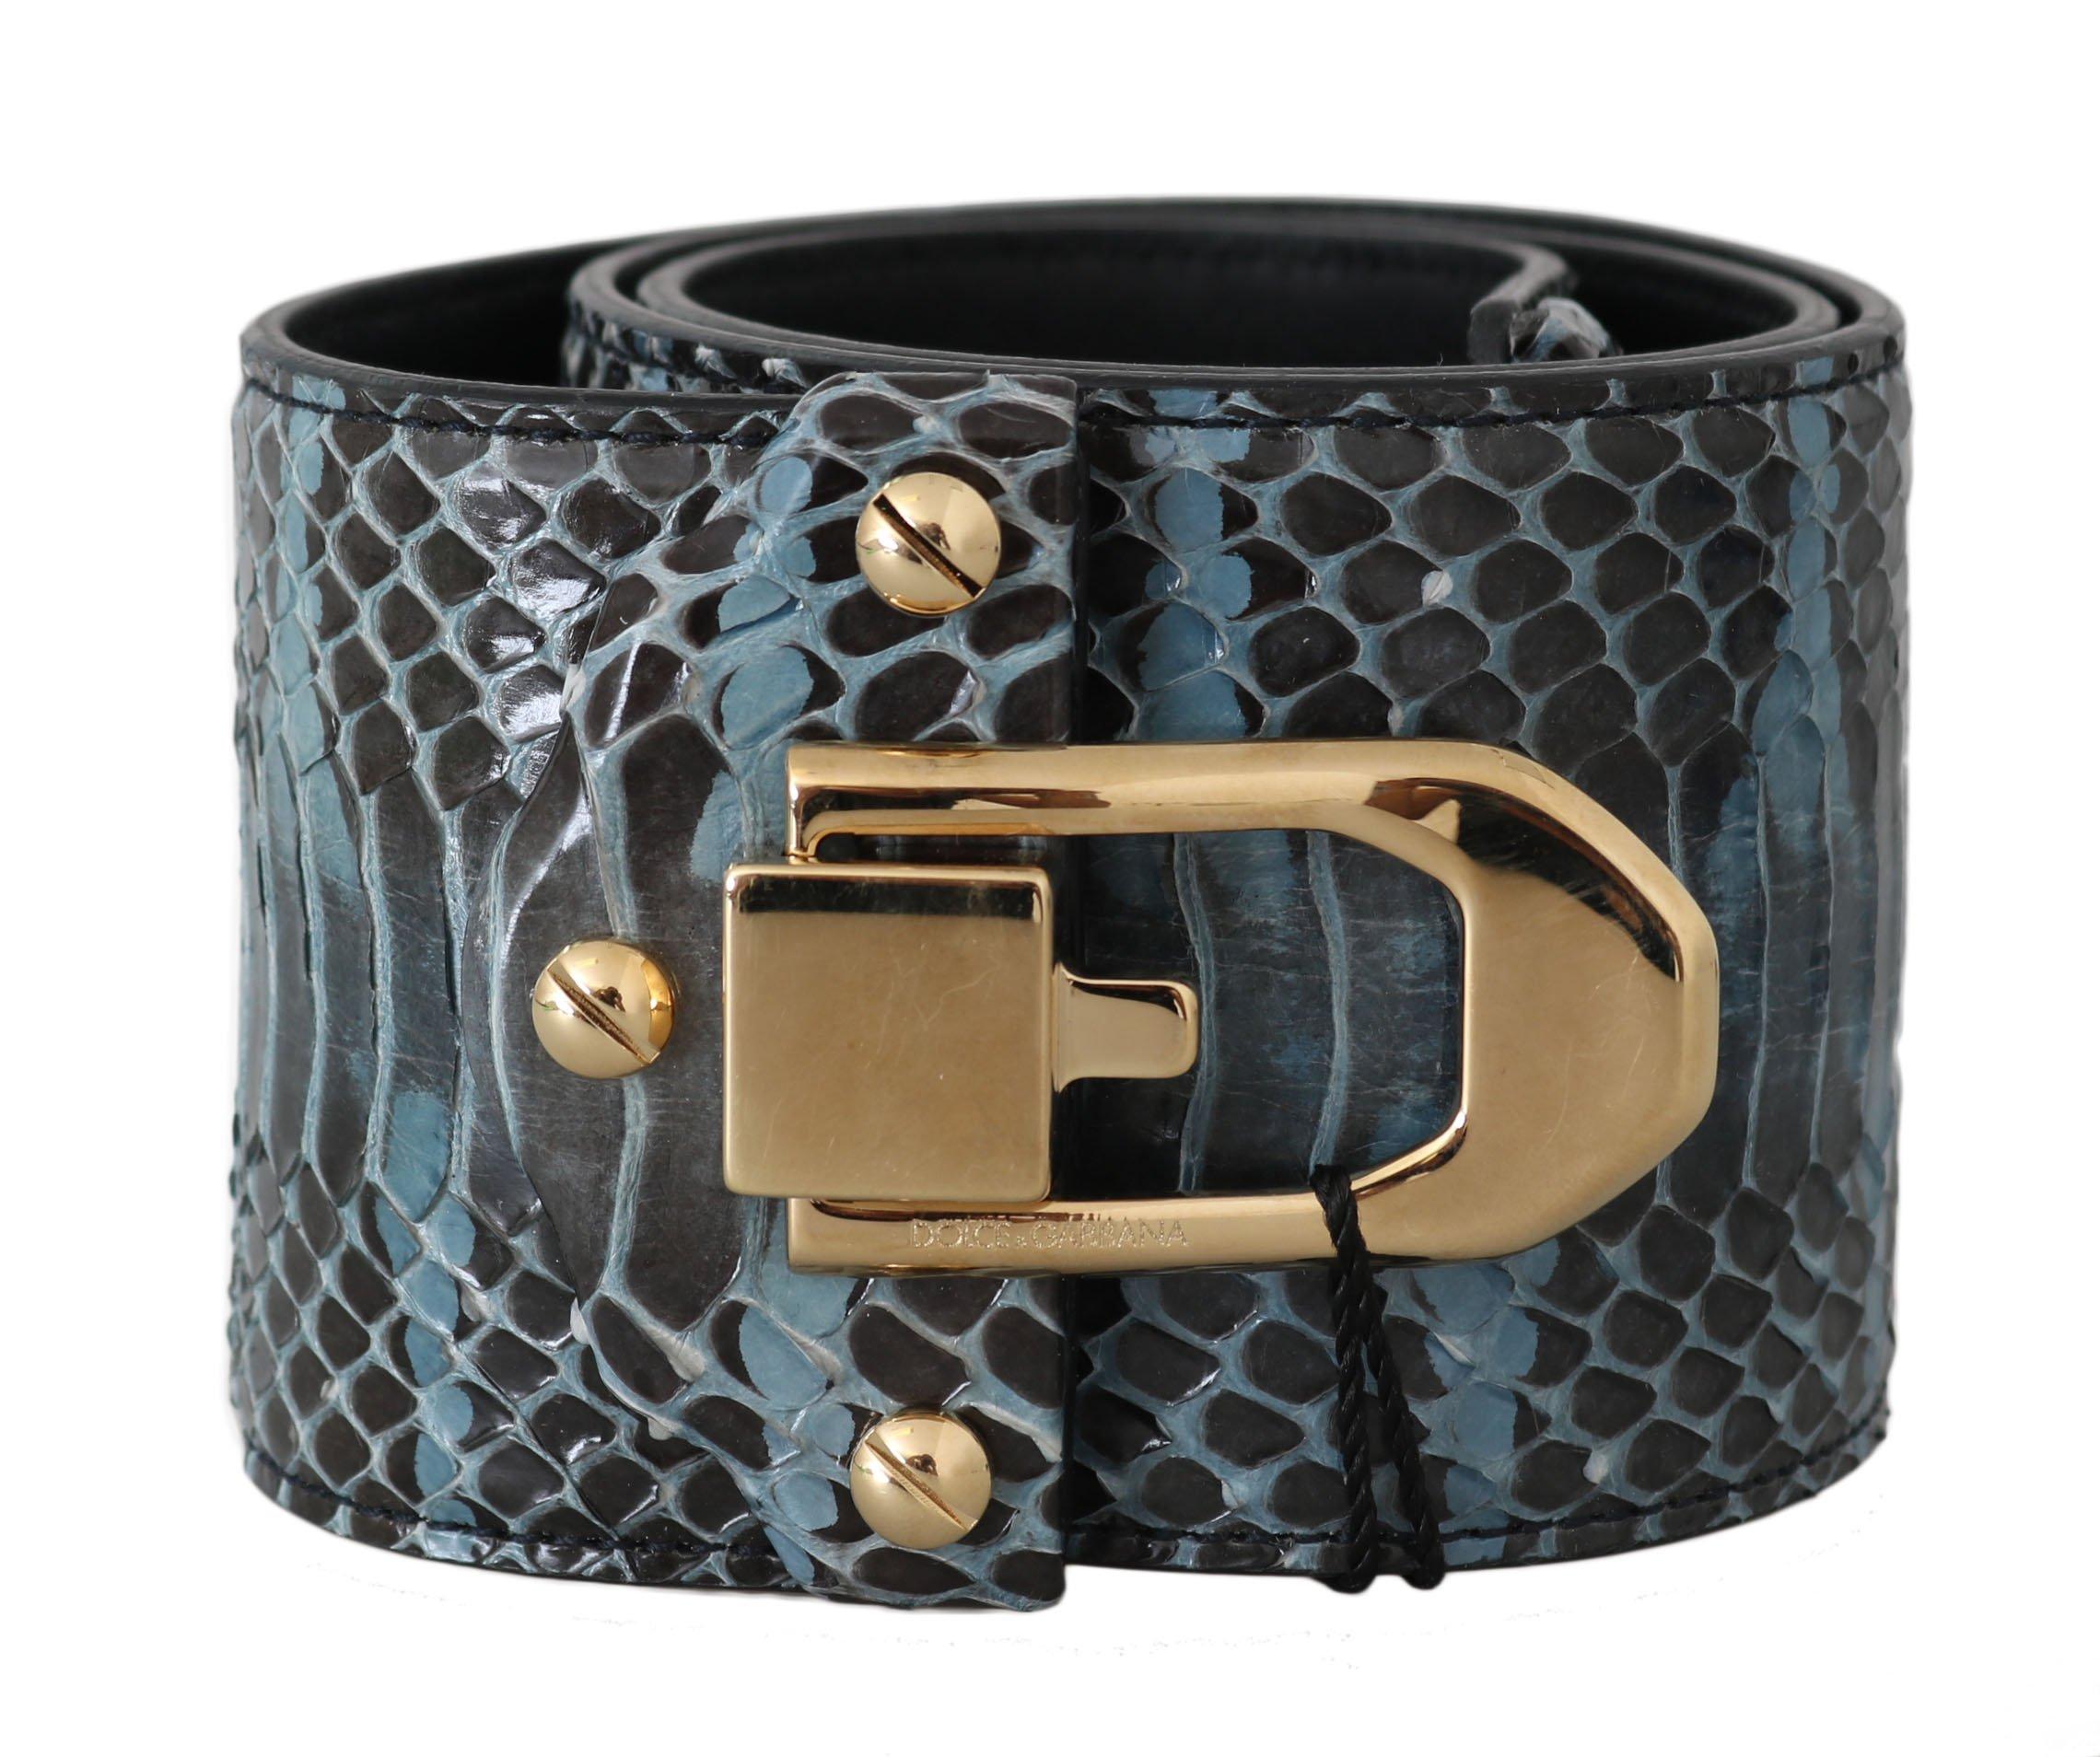 Dolce & Gabbana Women's Belt Blue BEL50210 - 80 cm / 32 Inches